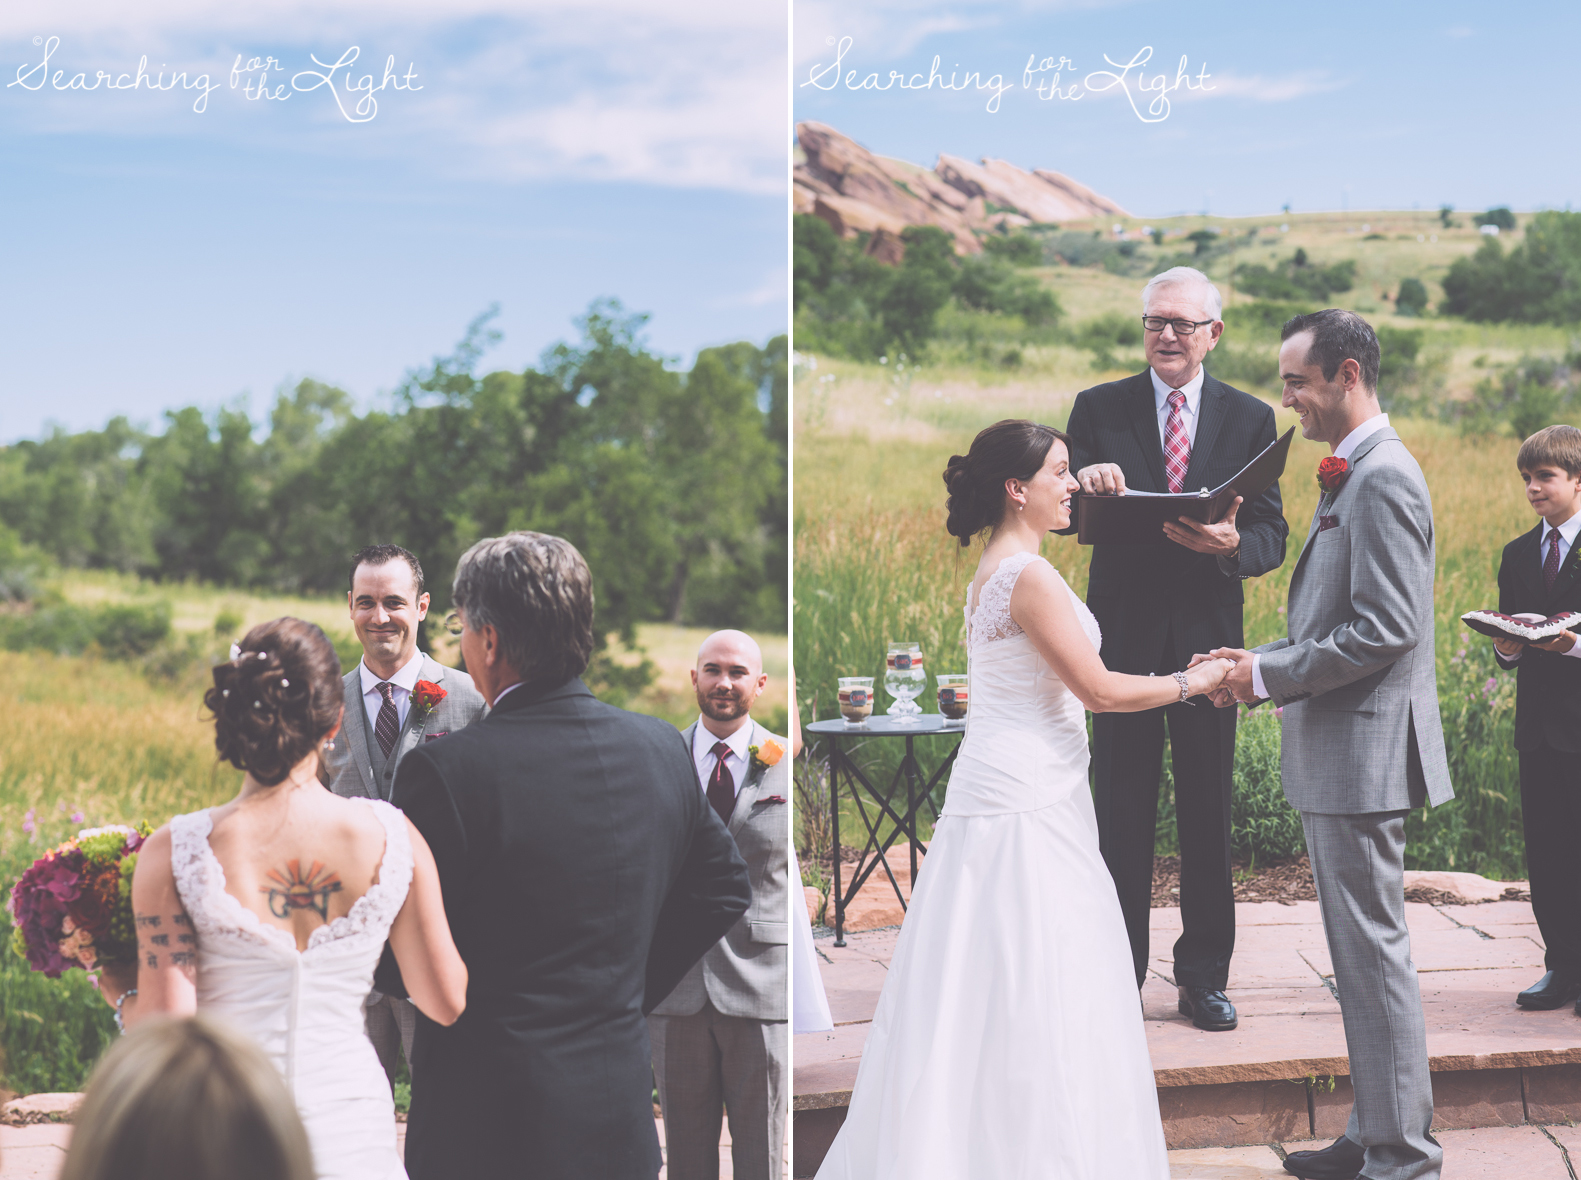 Red rocks wedding photo denver wedding photographer